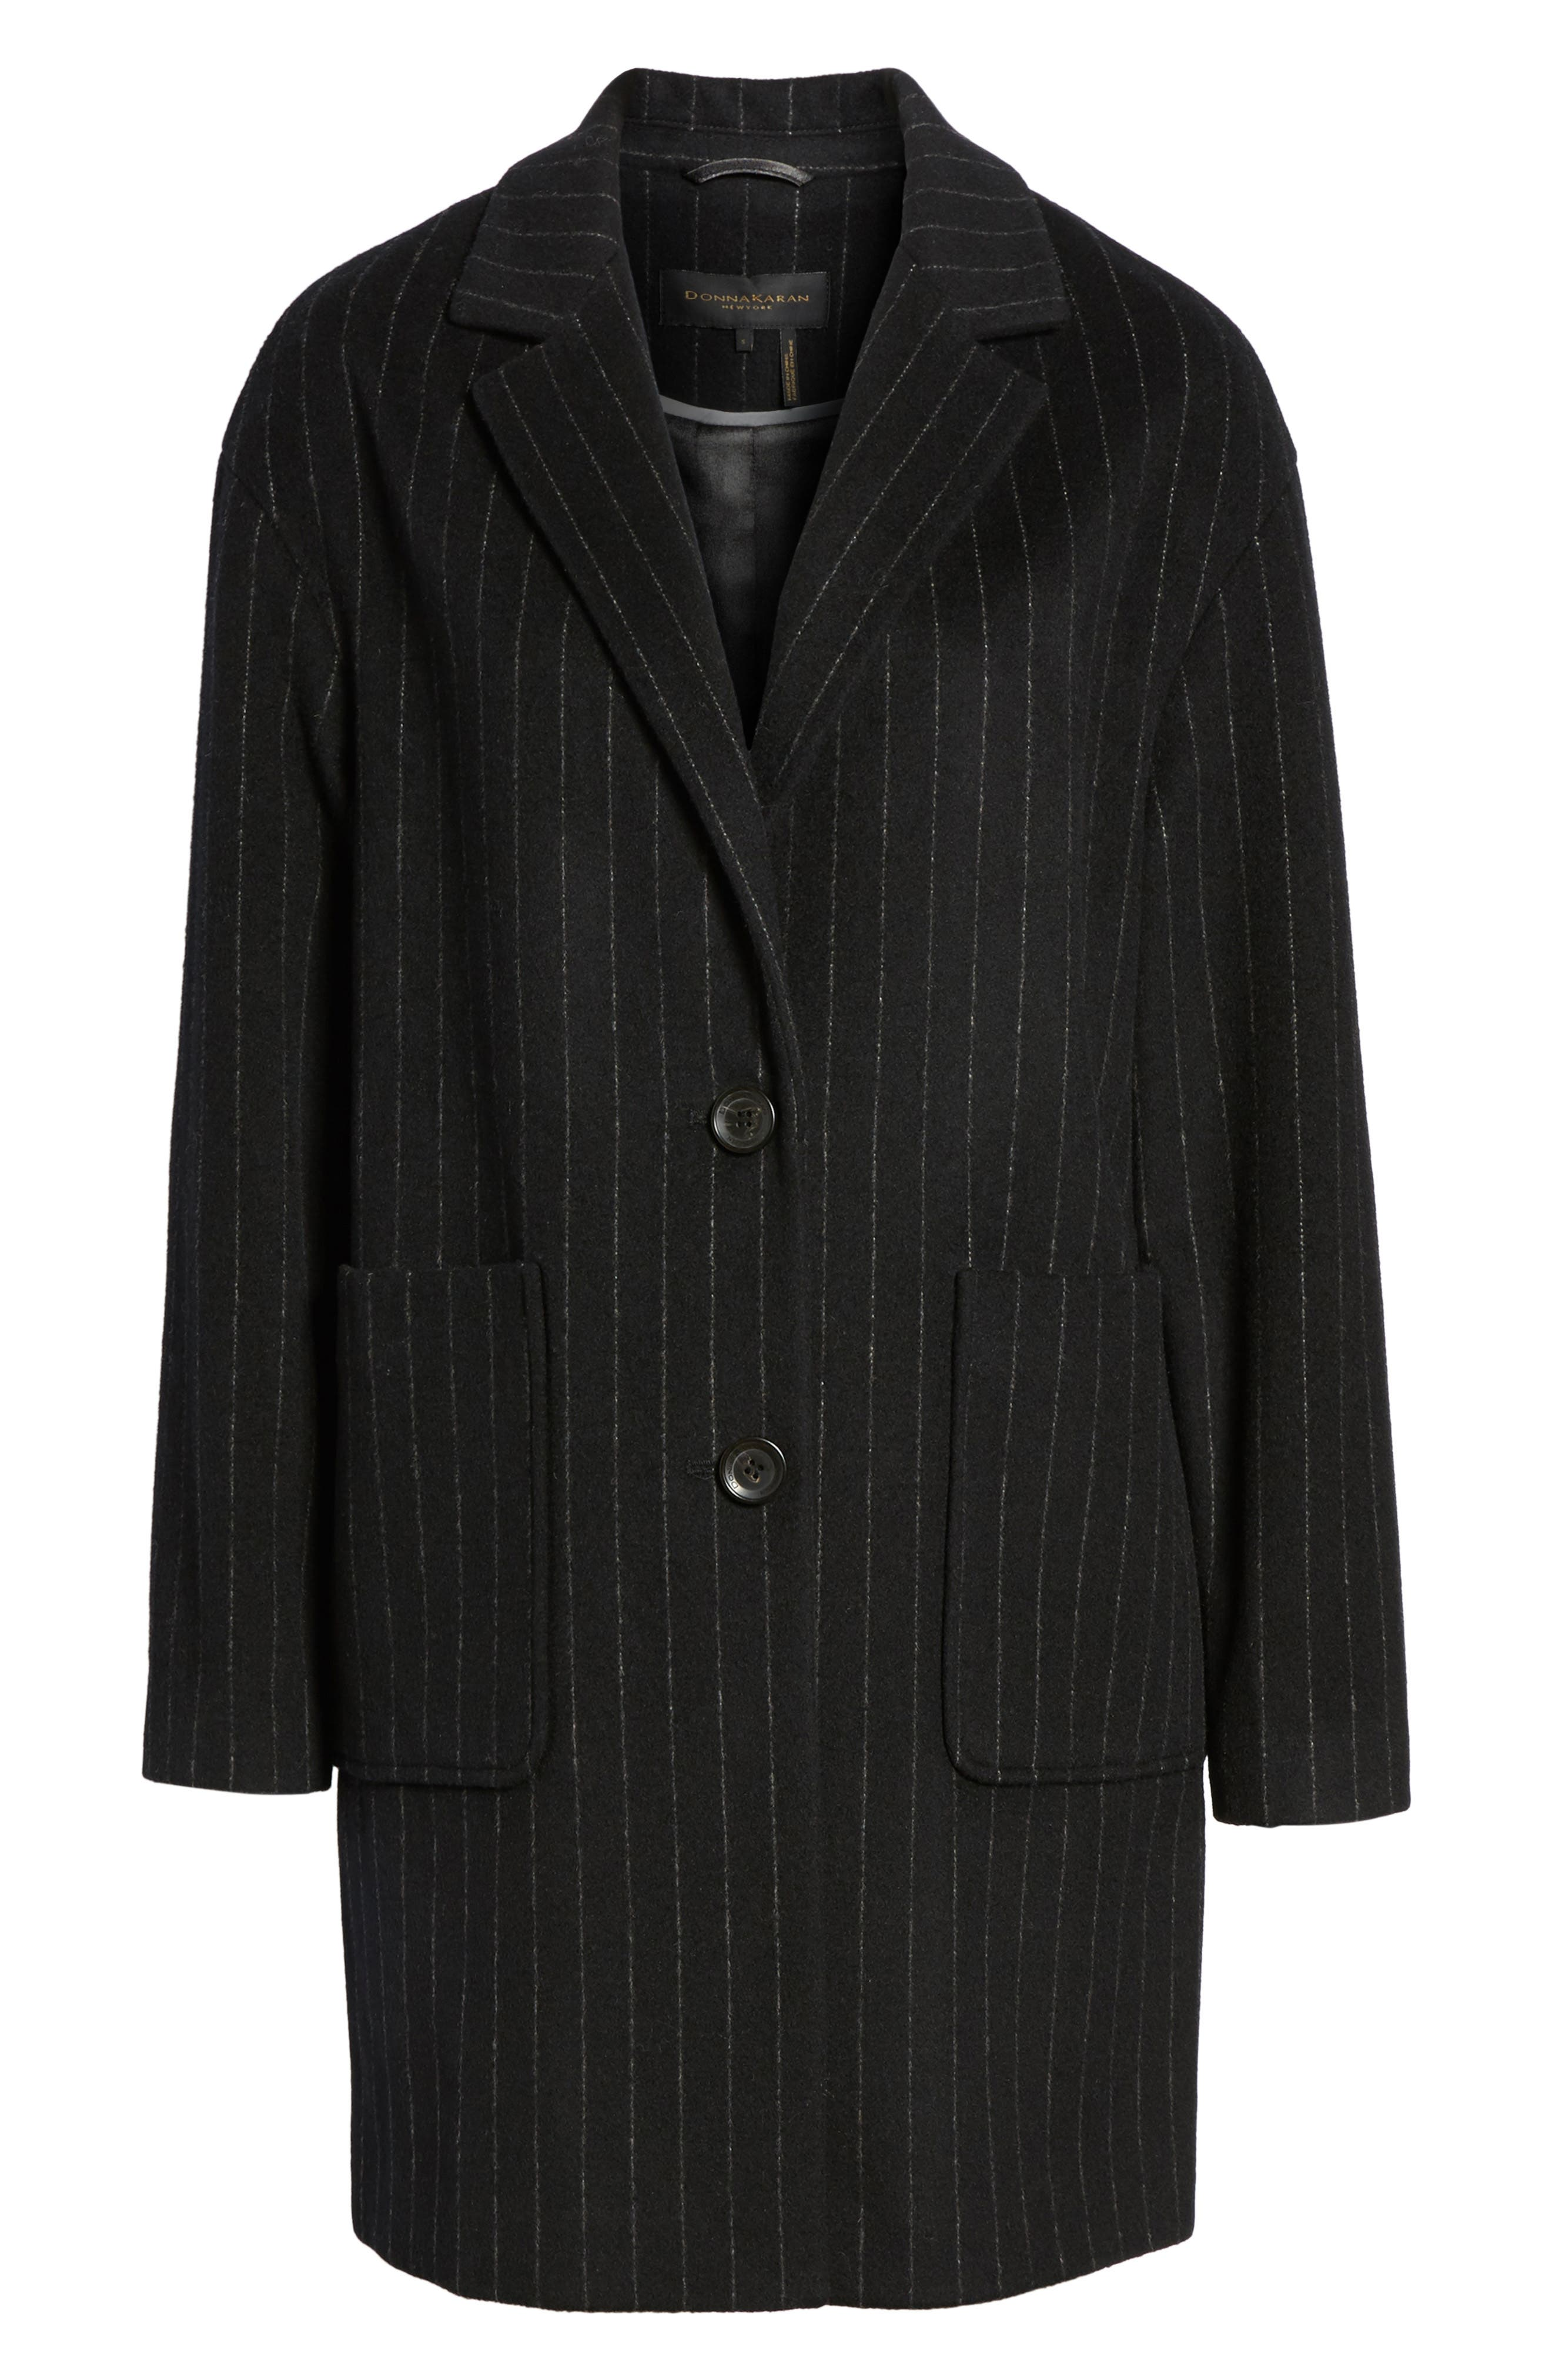 DKNY Pinstripe Wool Blend Coat,                             Alternate thumbnail 6, color,                             Black